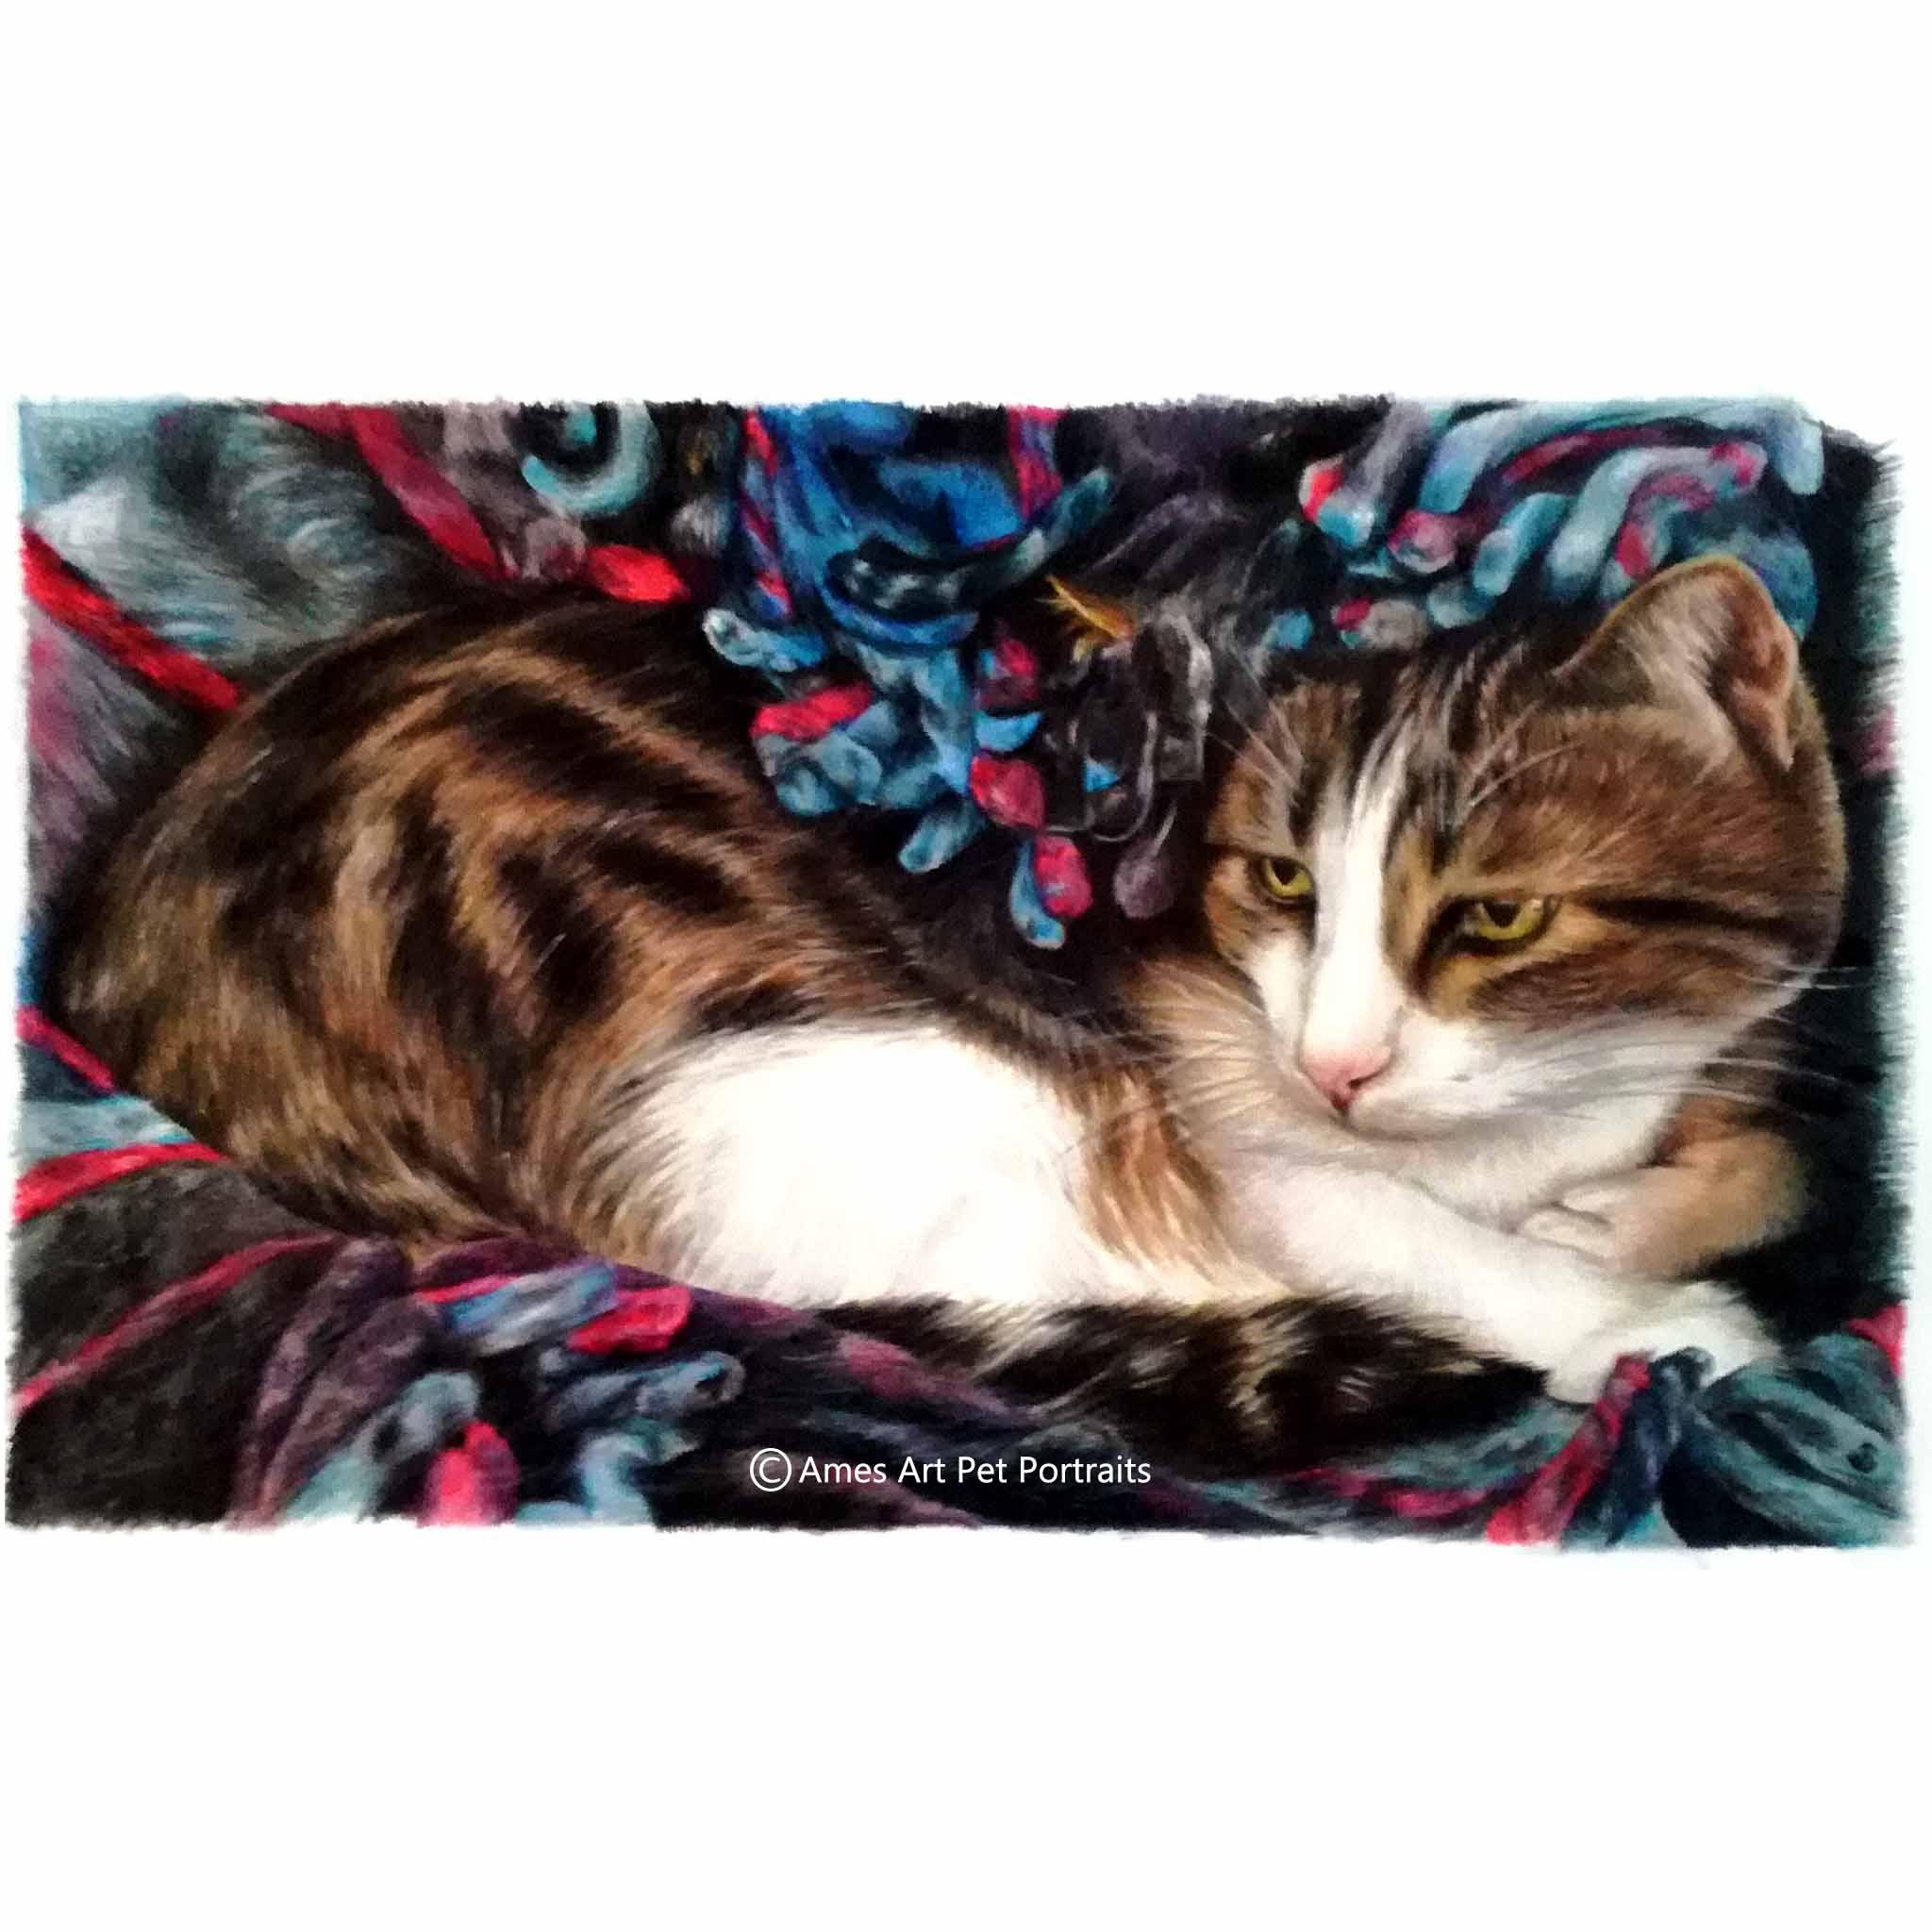 'Maka Lea' - USA, 11.7 x 16.5 inches, 2017, Color Pencil Cat Portrait